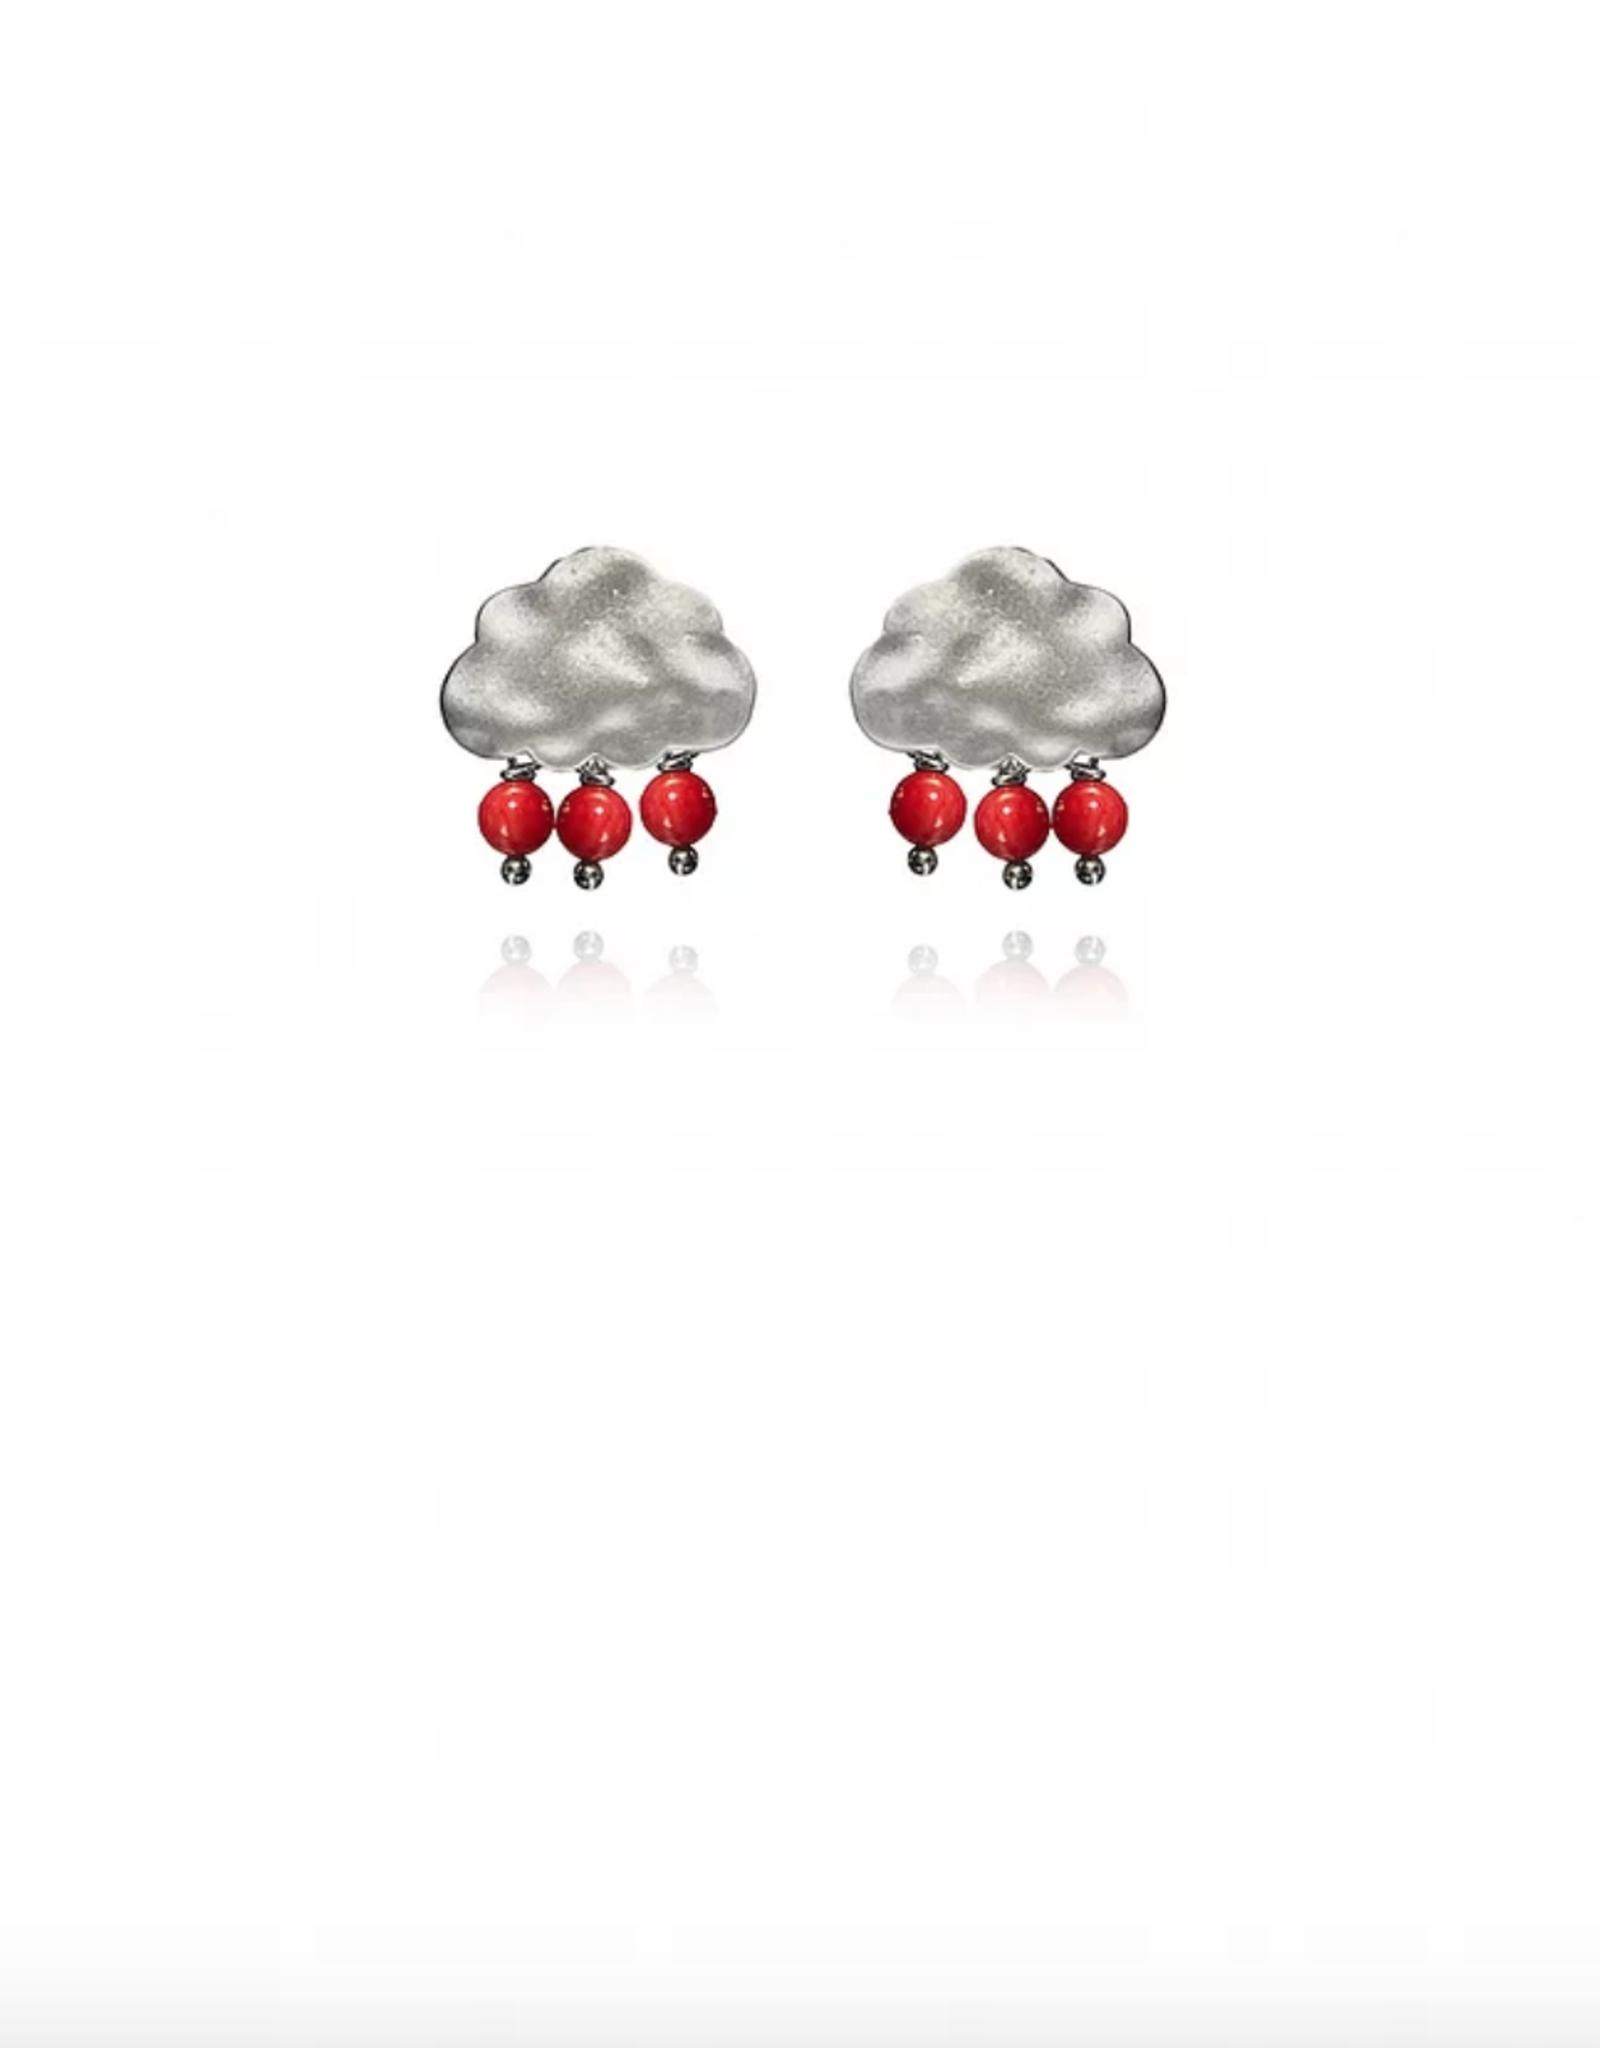 Lakoo Designs Silver Cloud 3 Red Drops